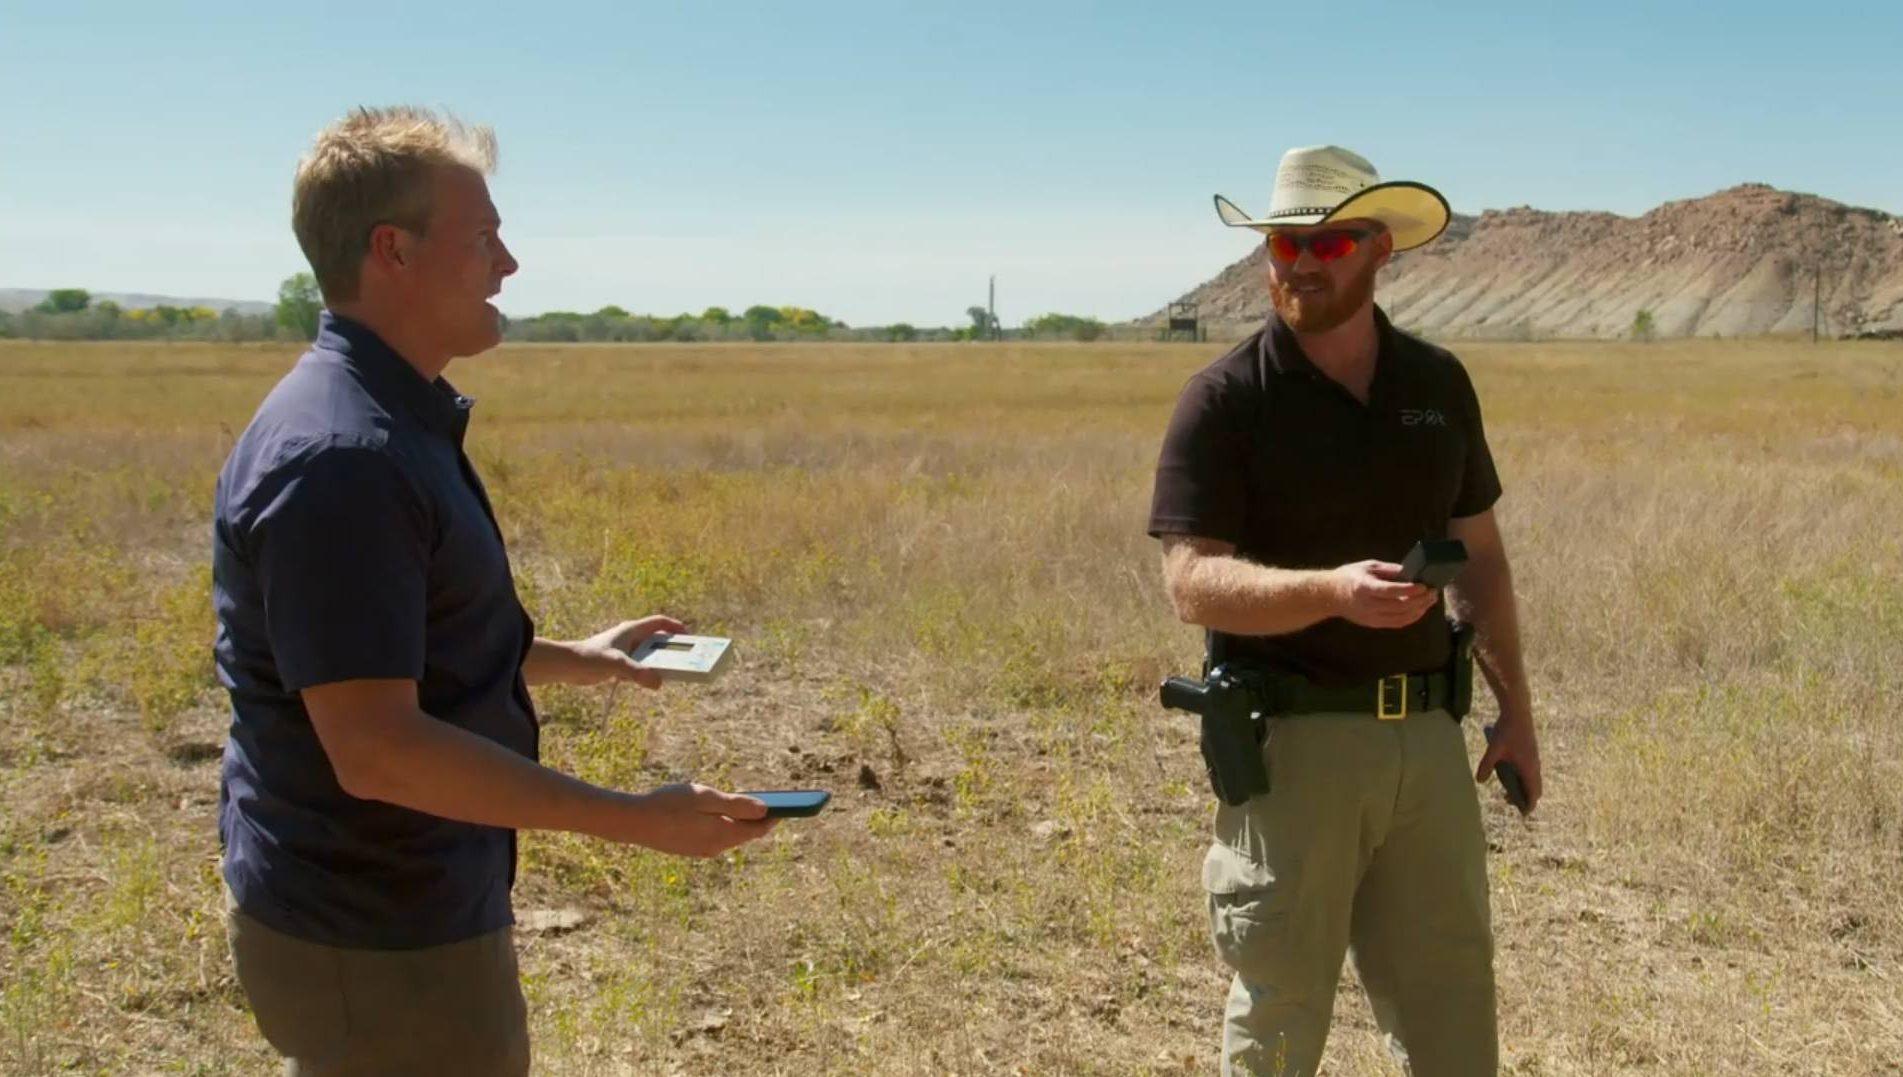 How DId The Secret Of Skinwalker Ranch S02E07 End?